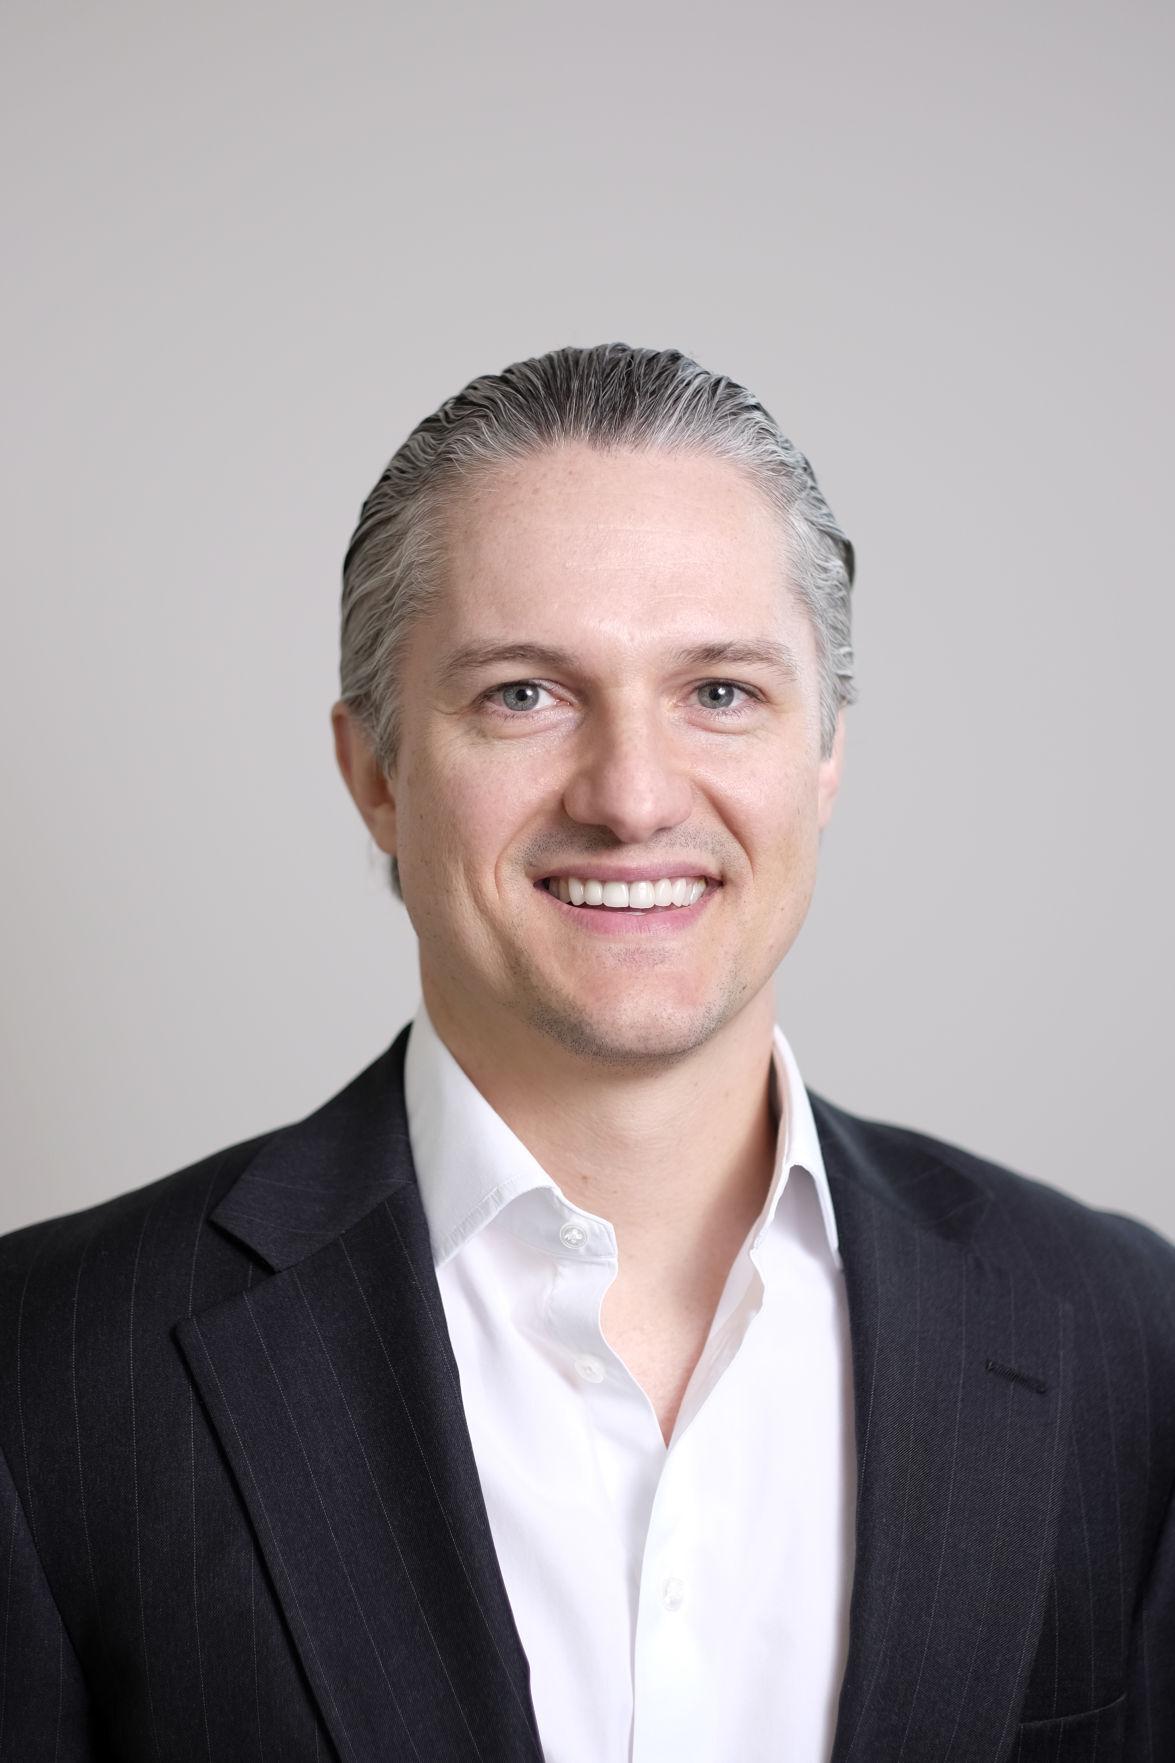 Justin Boisseau